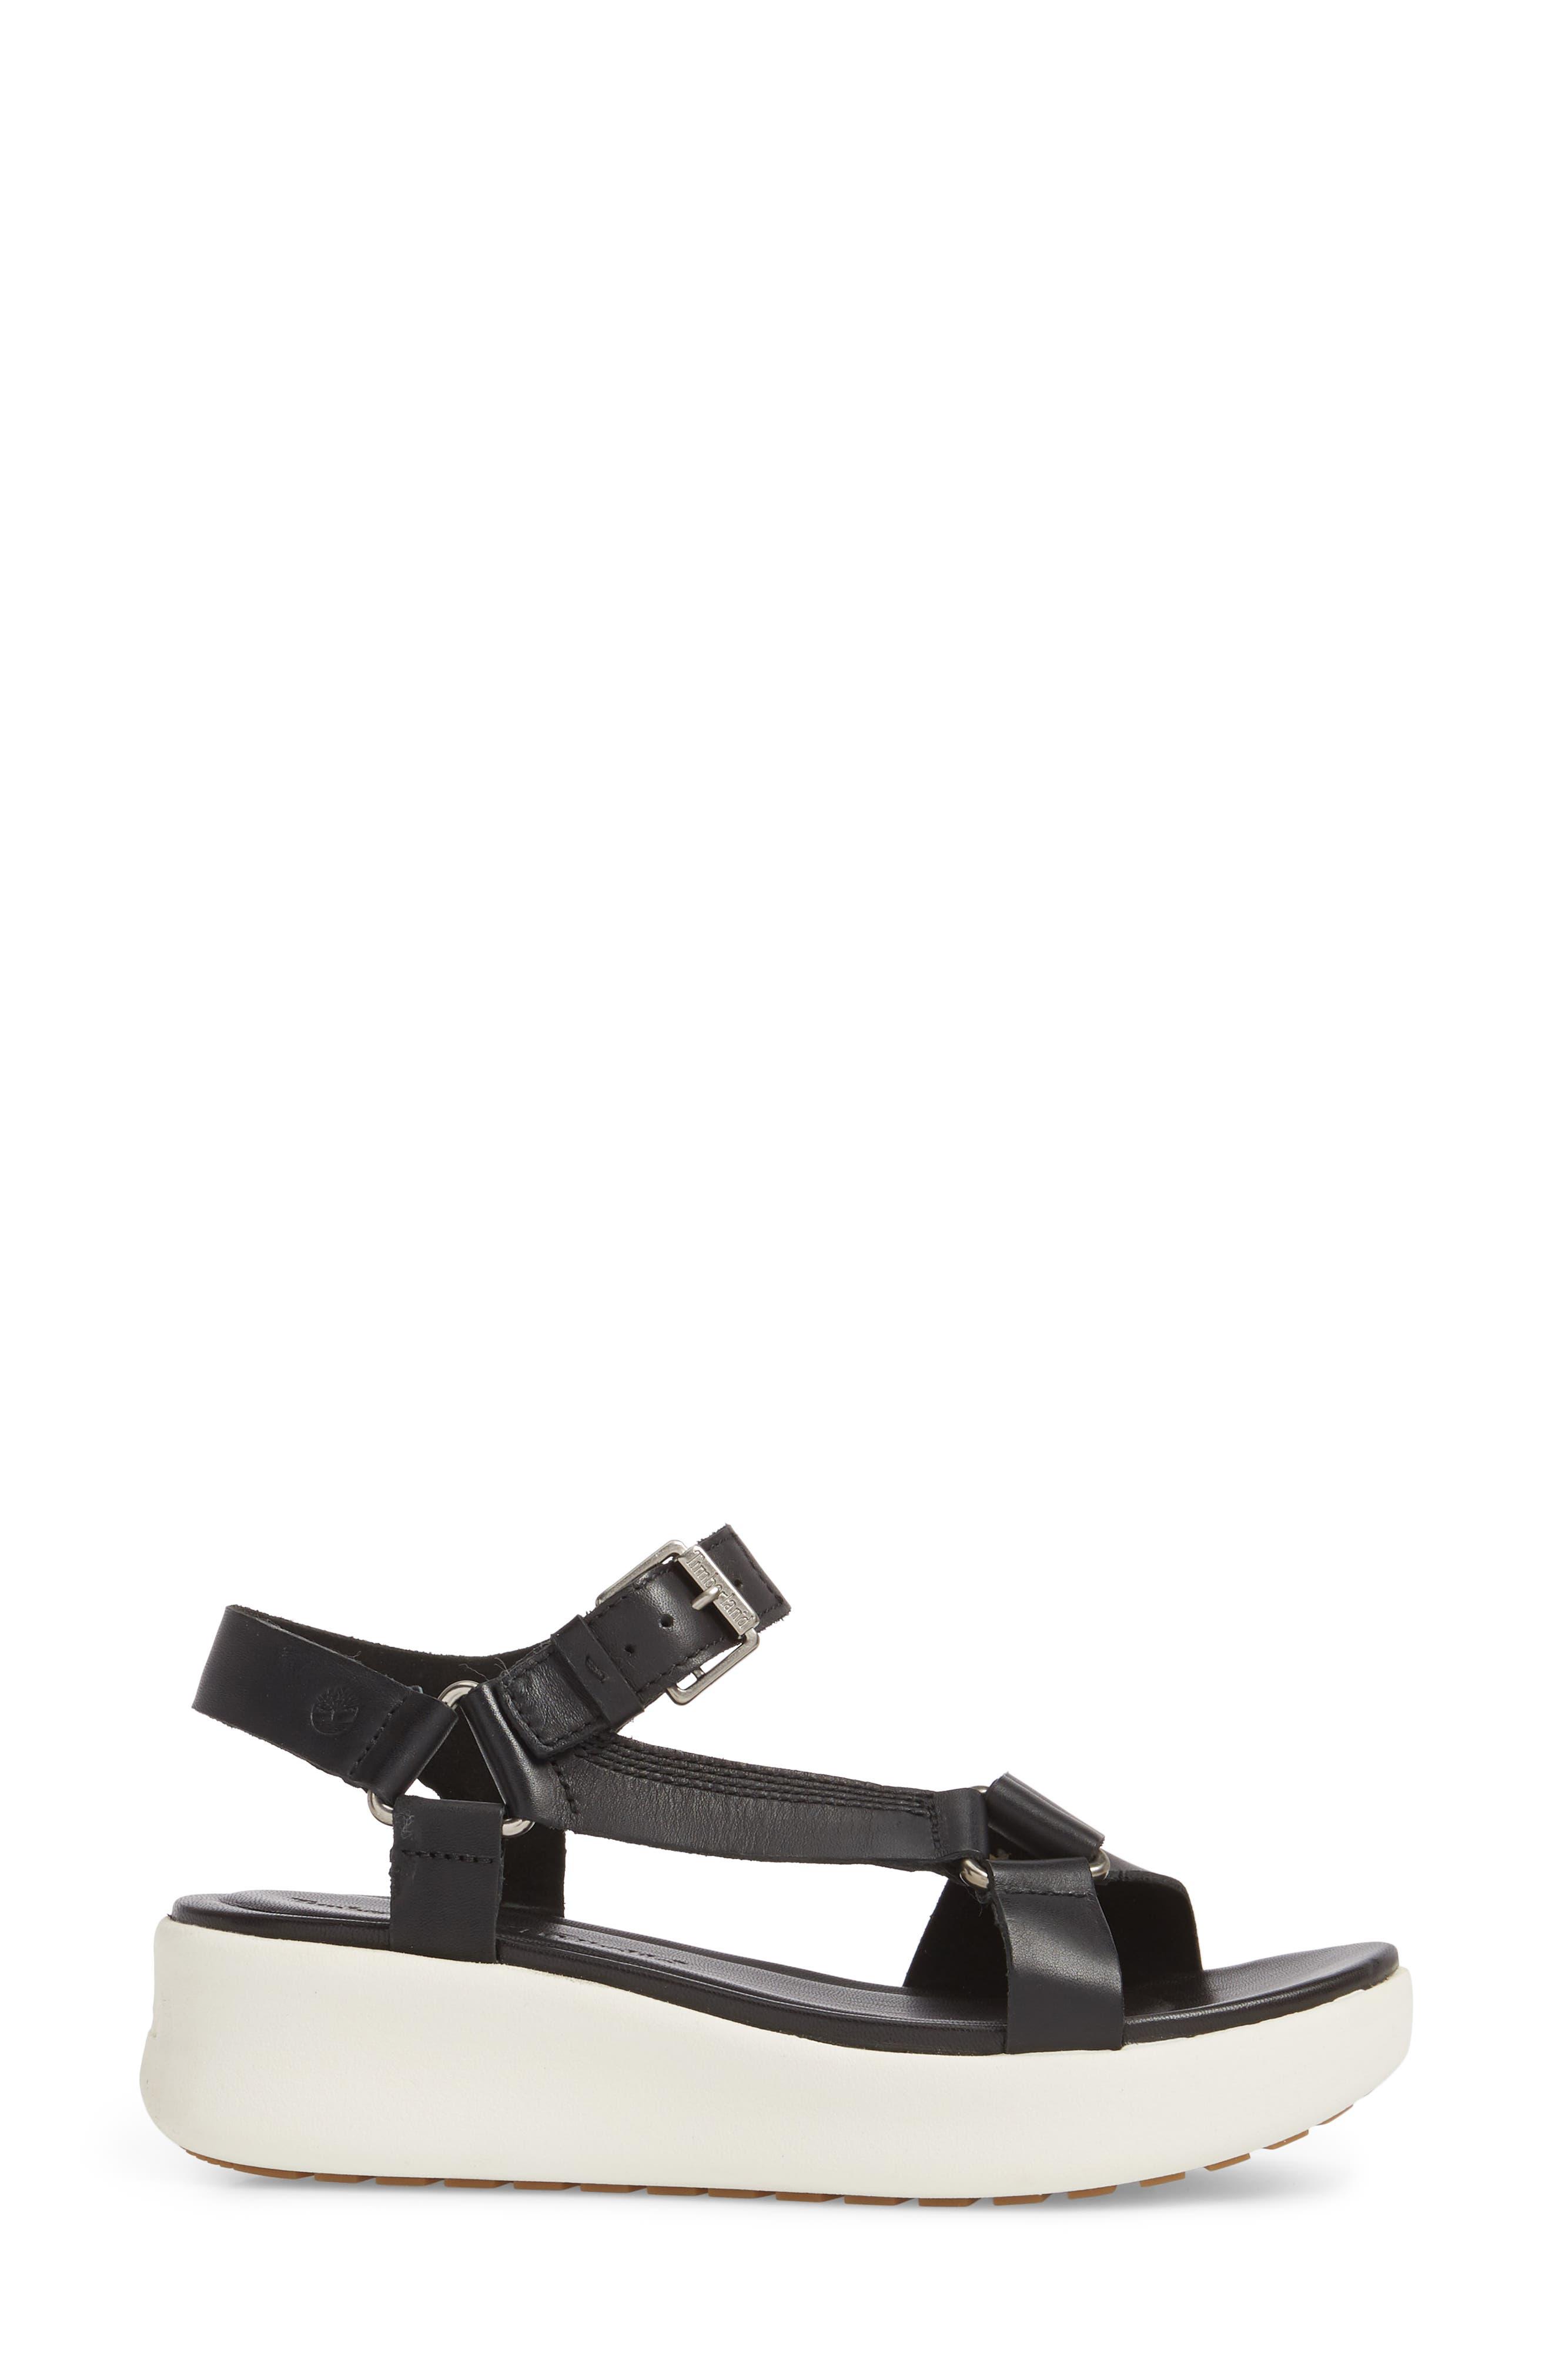 Los Angeles Wind Sport Sandal,                             Alternate thumbnail 3, color,                             Black Leather